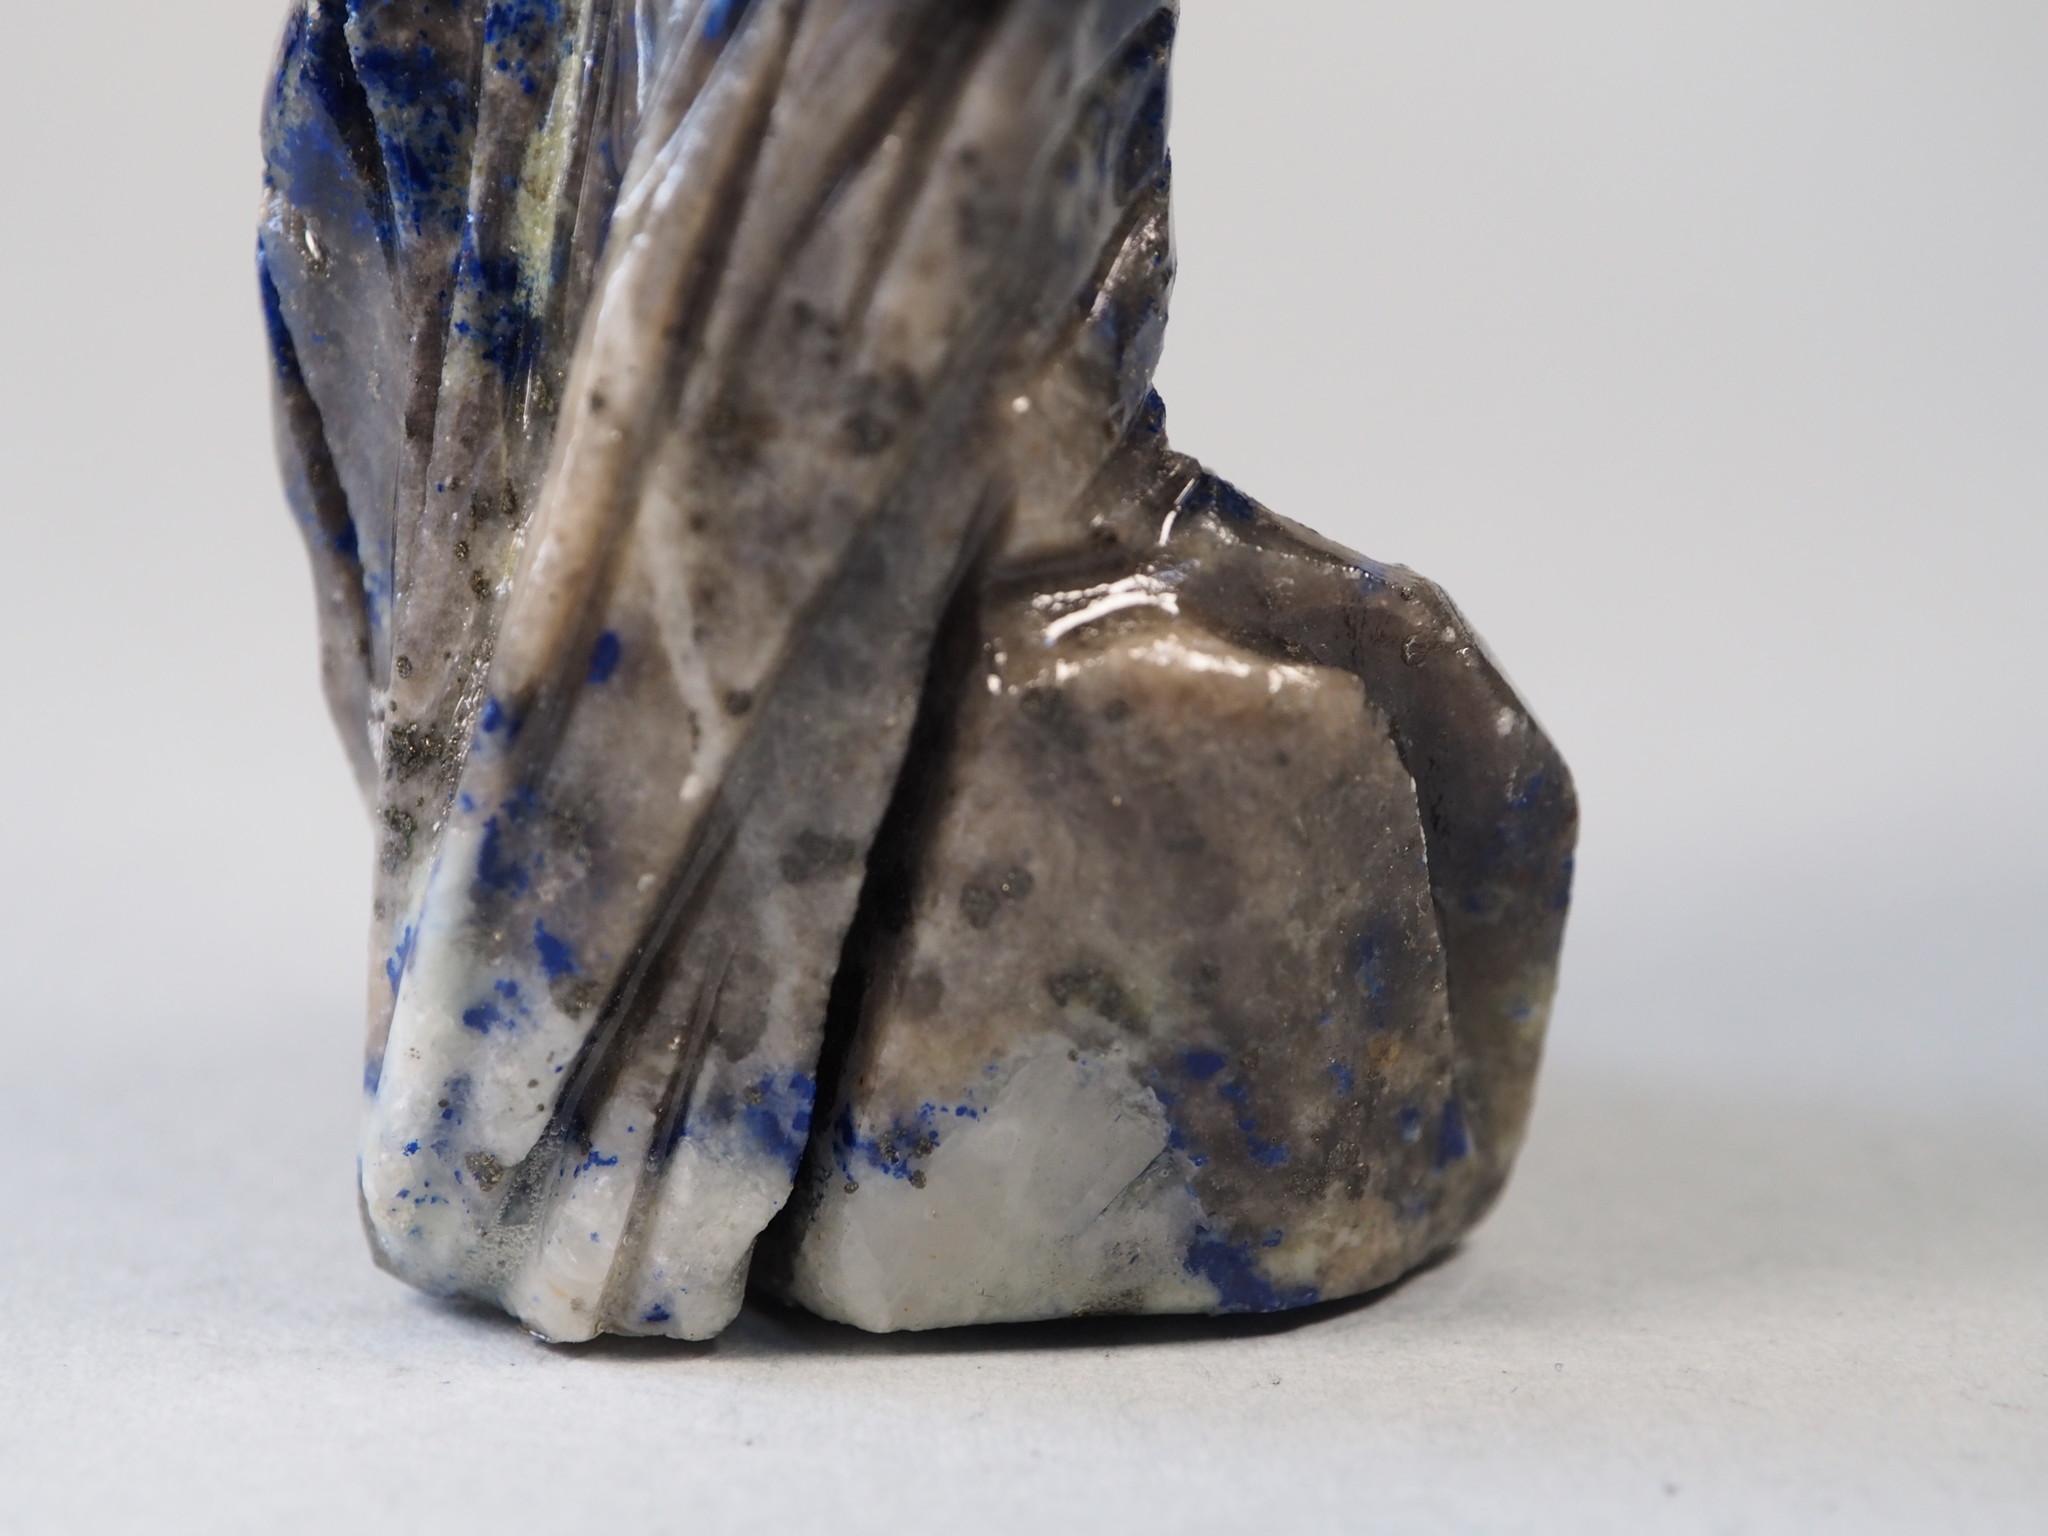 Extravagant Royal blau Lapis lazuli  tier figur briefbeschwere Adler Nr:21/8